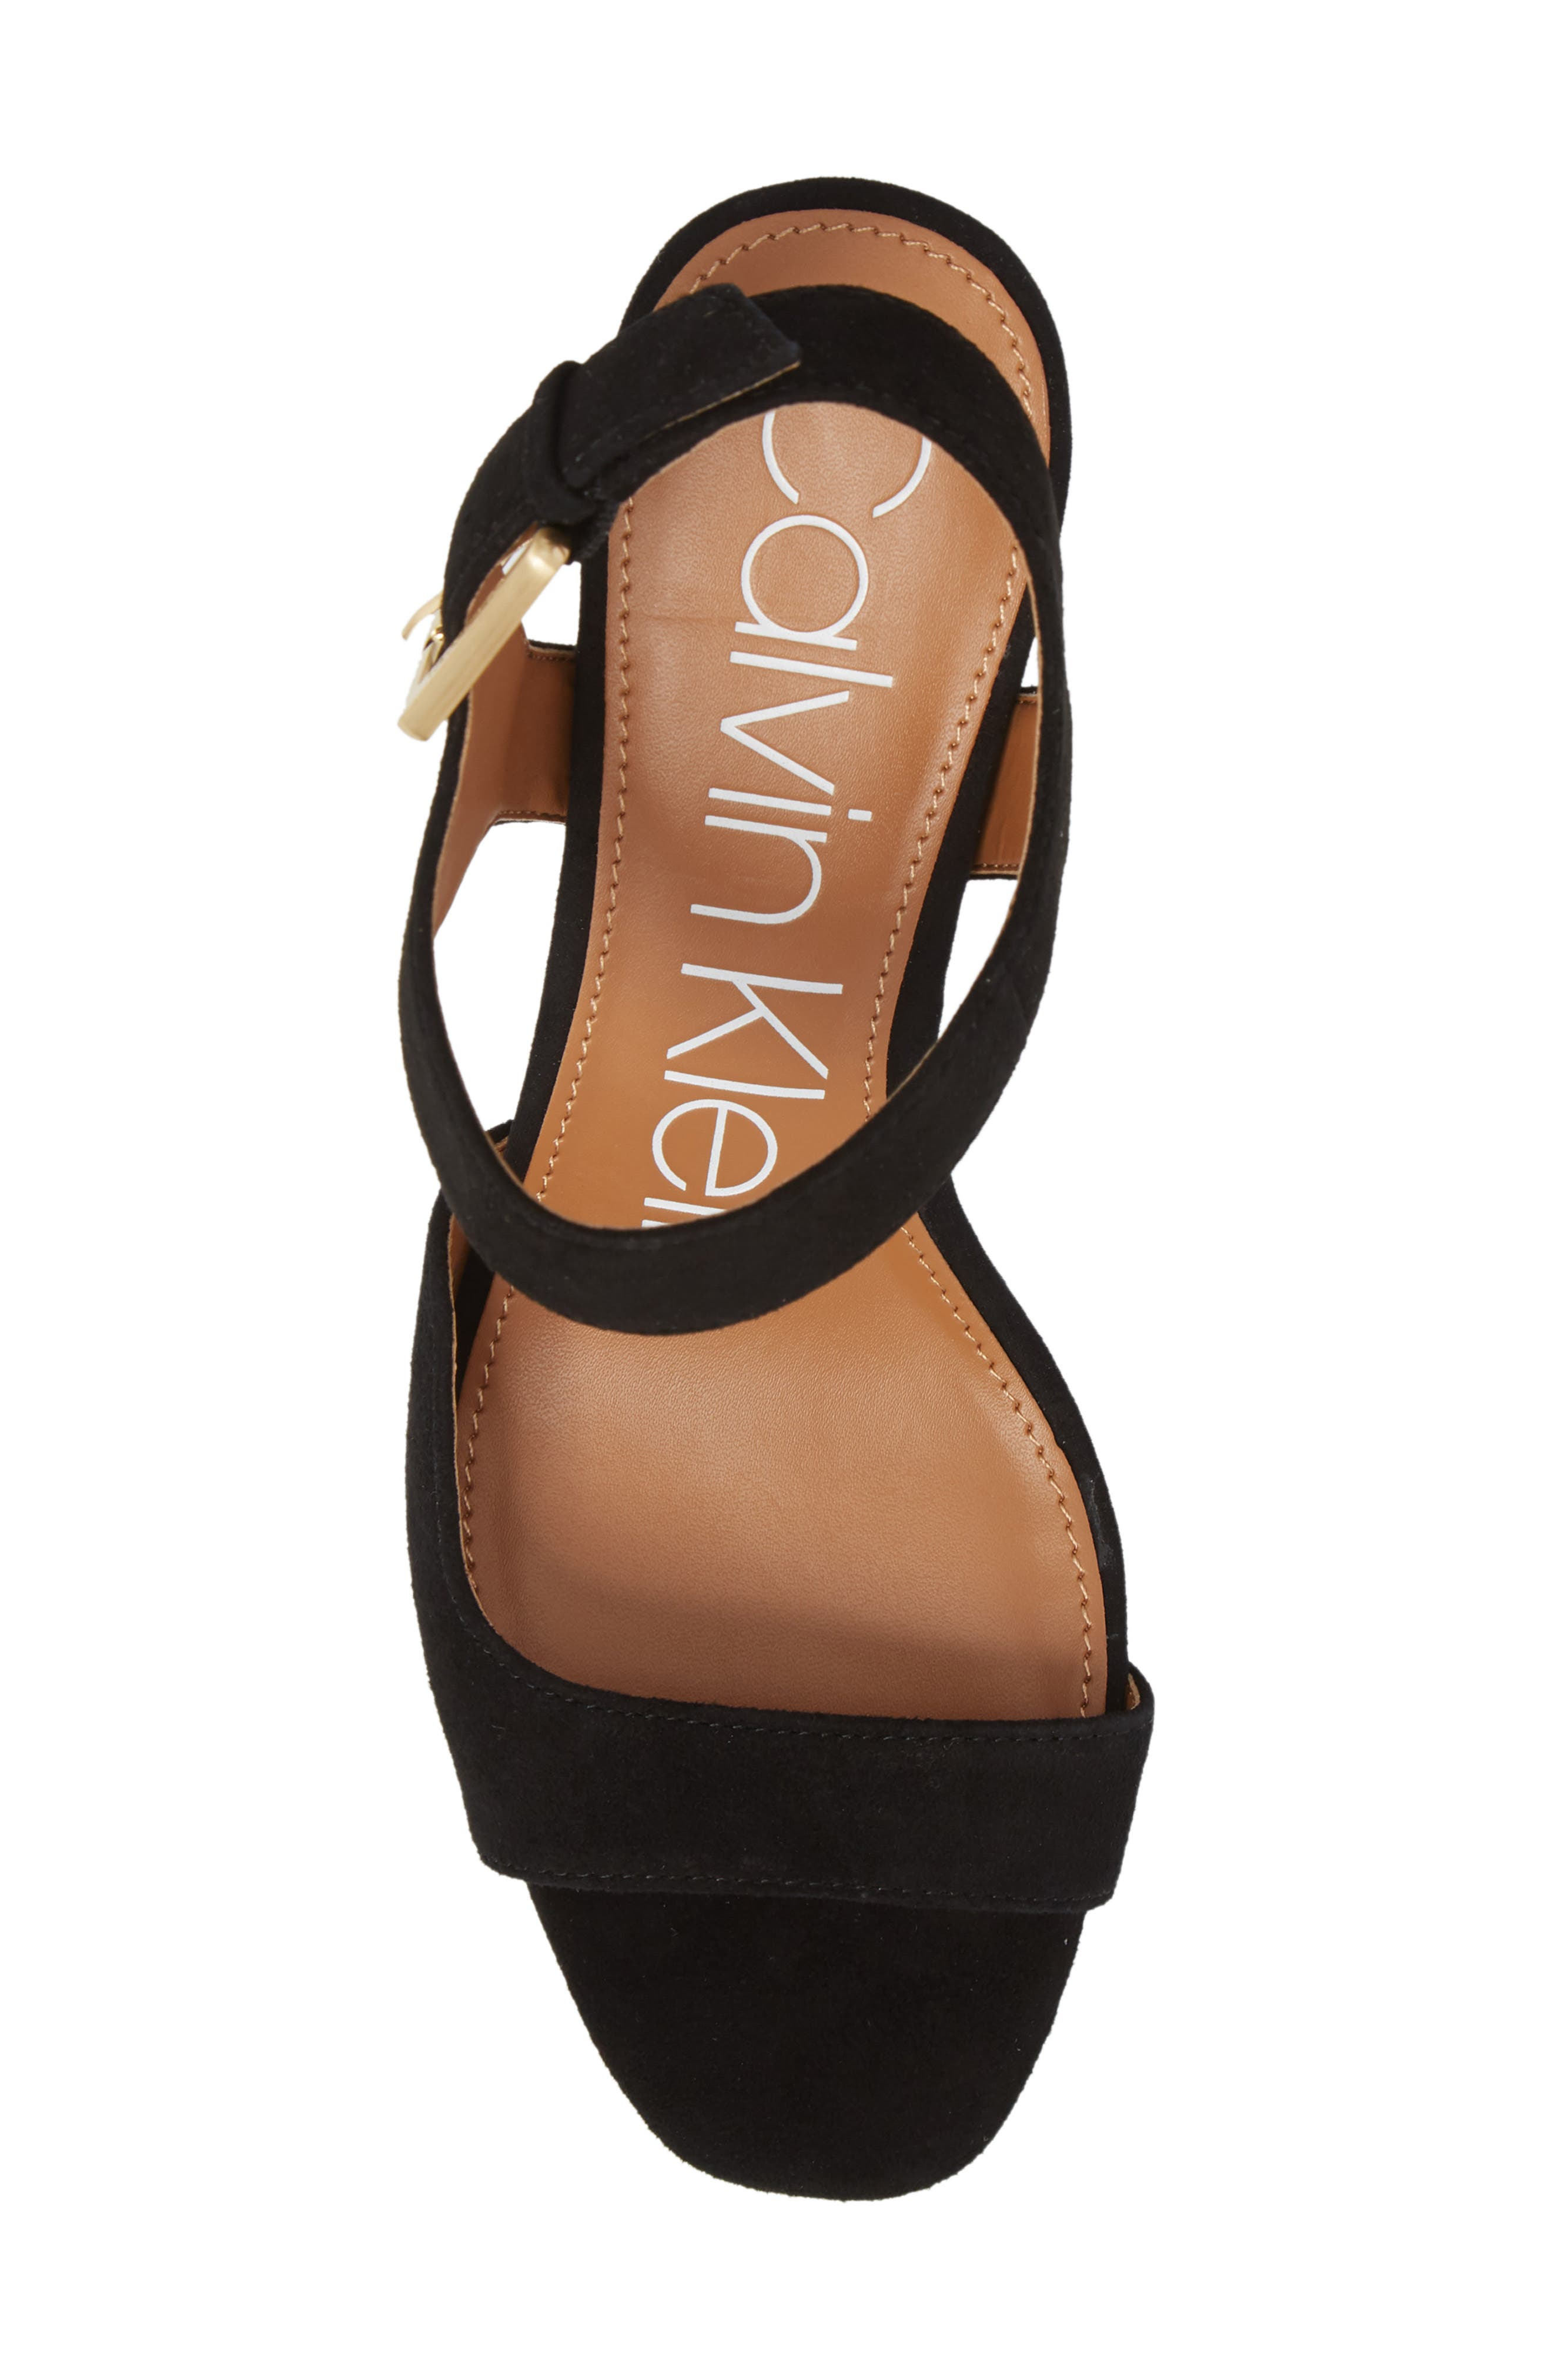 Chantay Asymmetrical Sandal,                             Alternate thumbnail 5, color,                             001